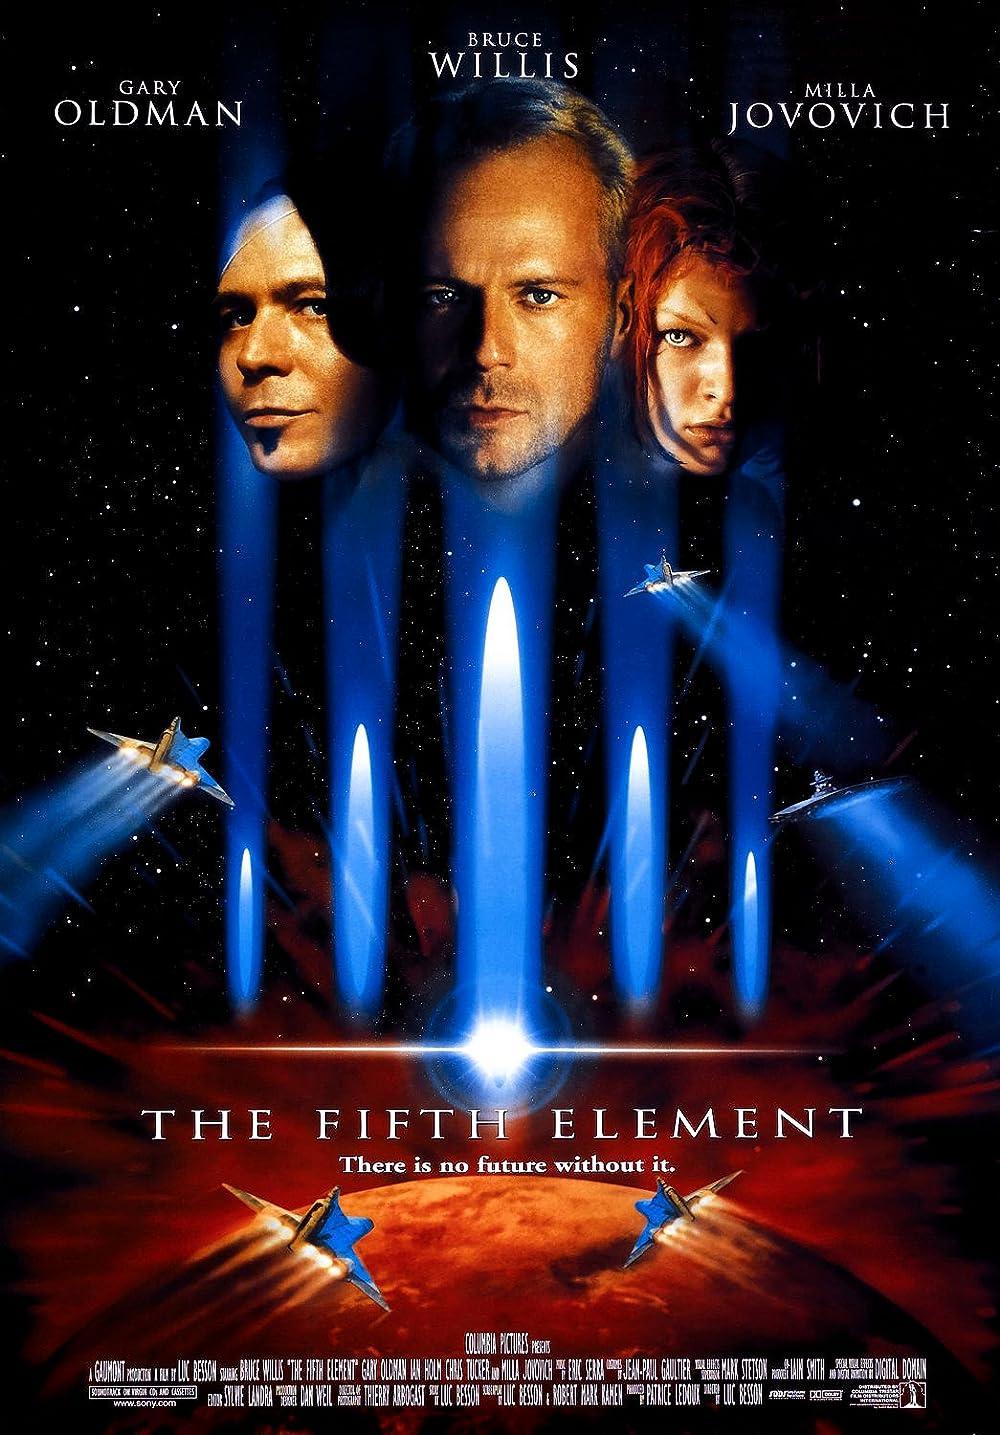 The Fifth Element (1997) - IMDb